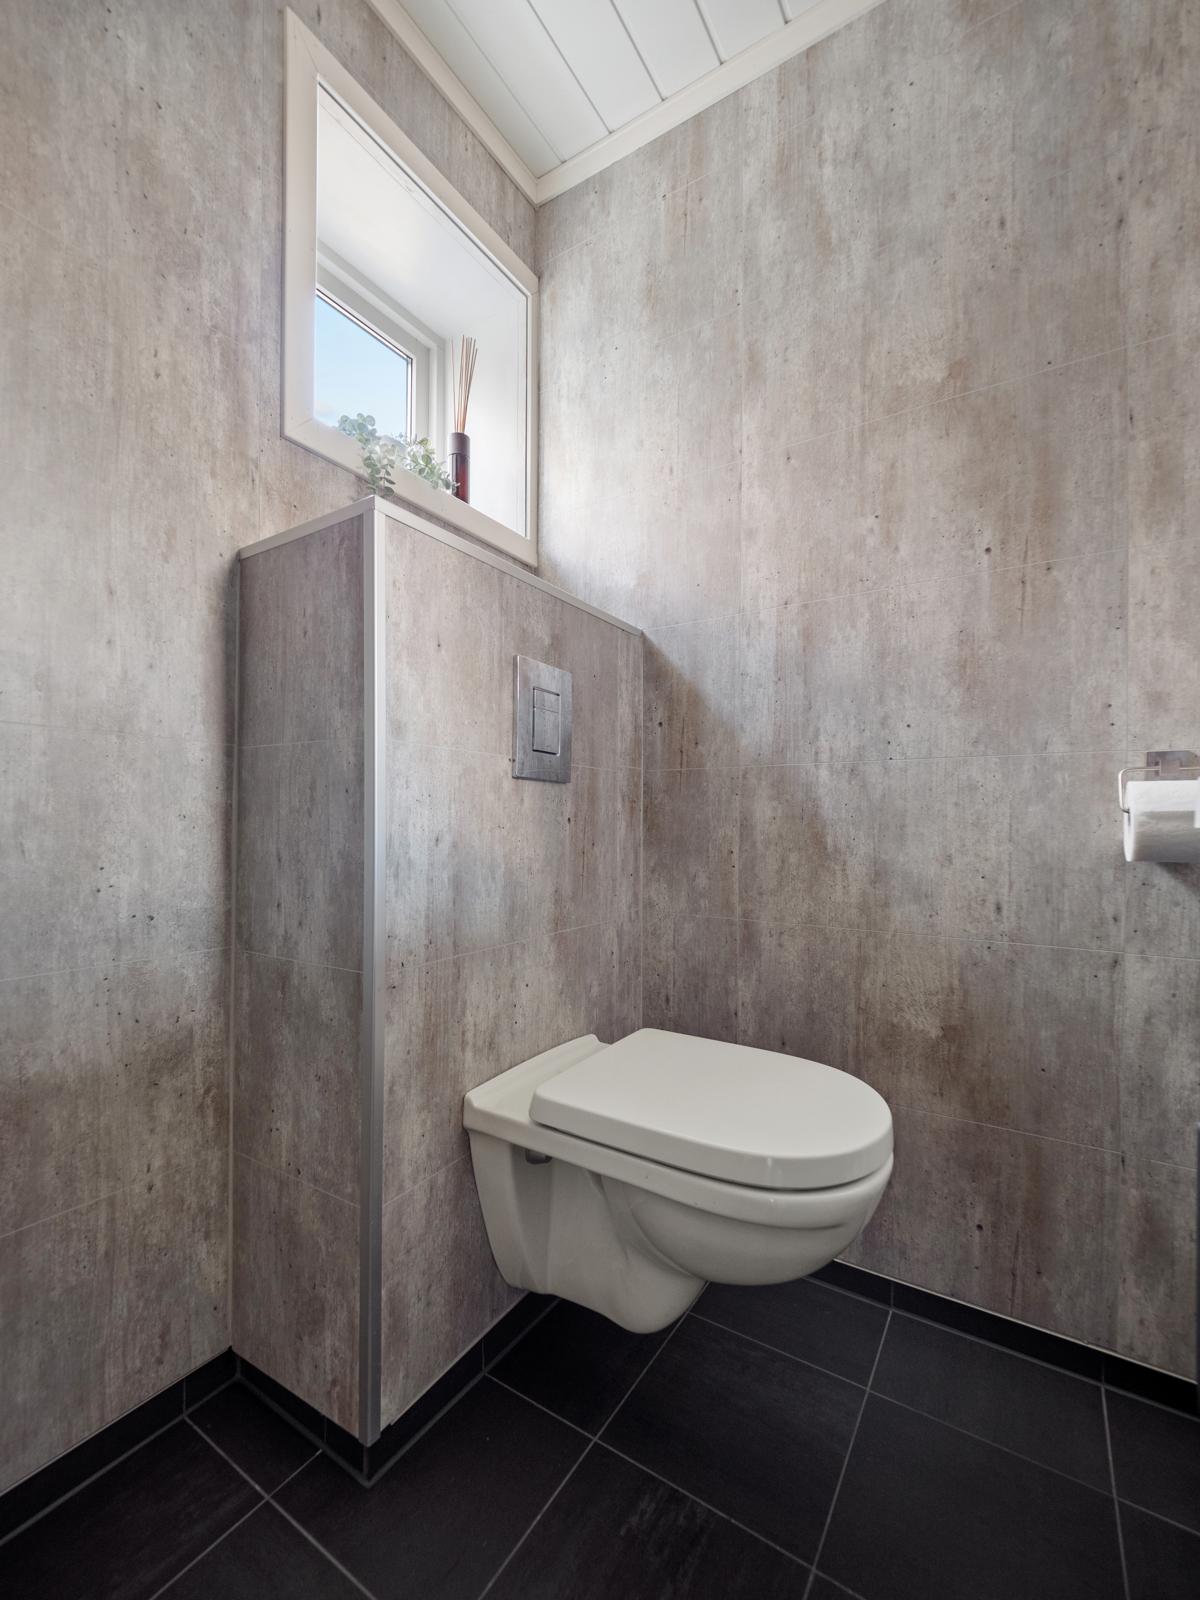 Vegghengt toalett.